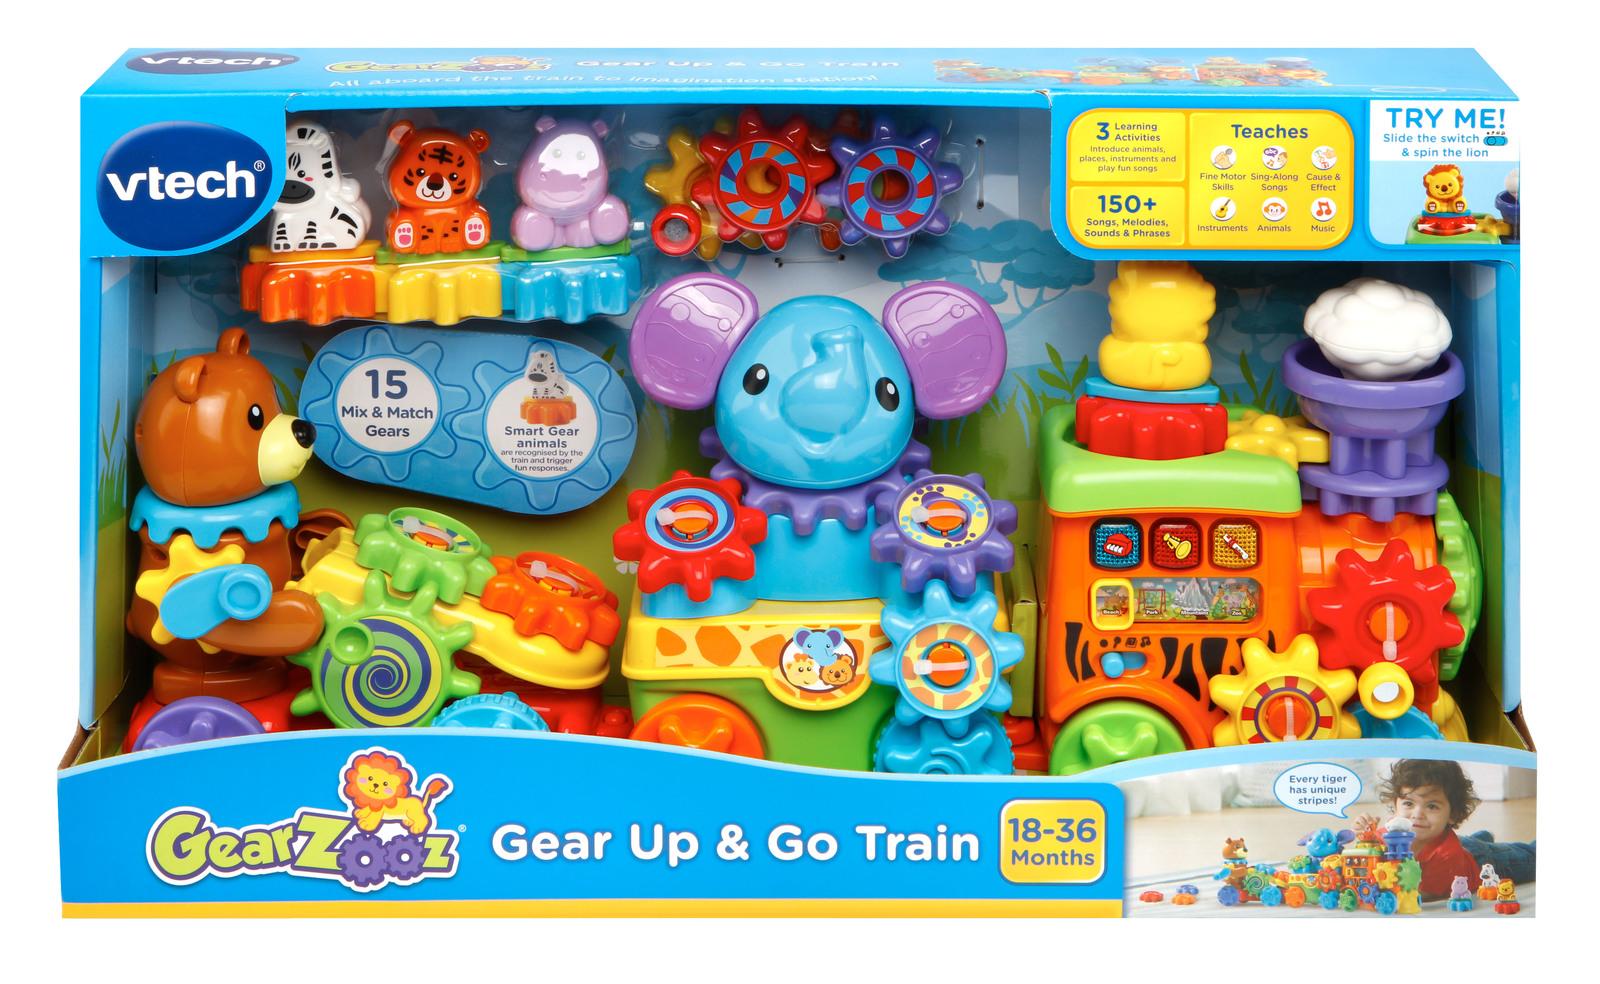 Vtech: Gearzooz - Gear Up & Go Train image